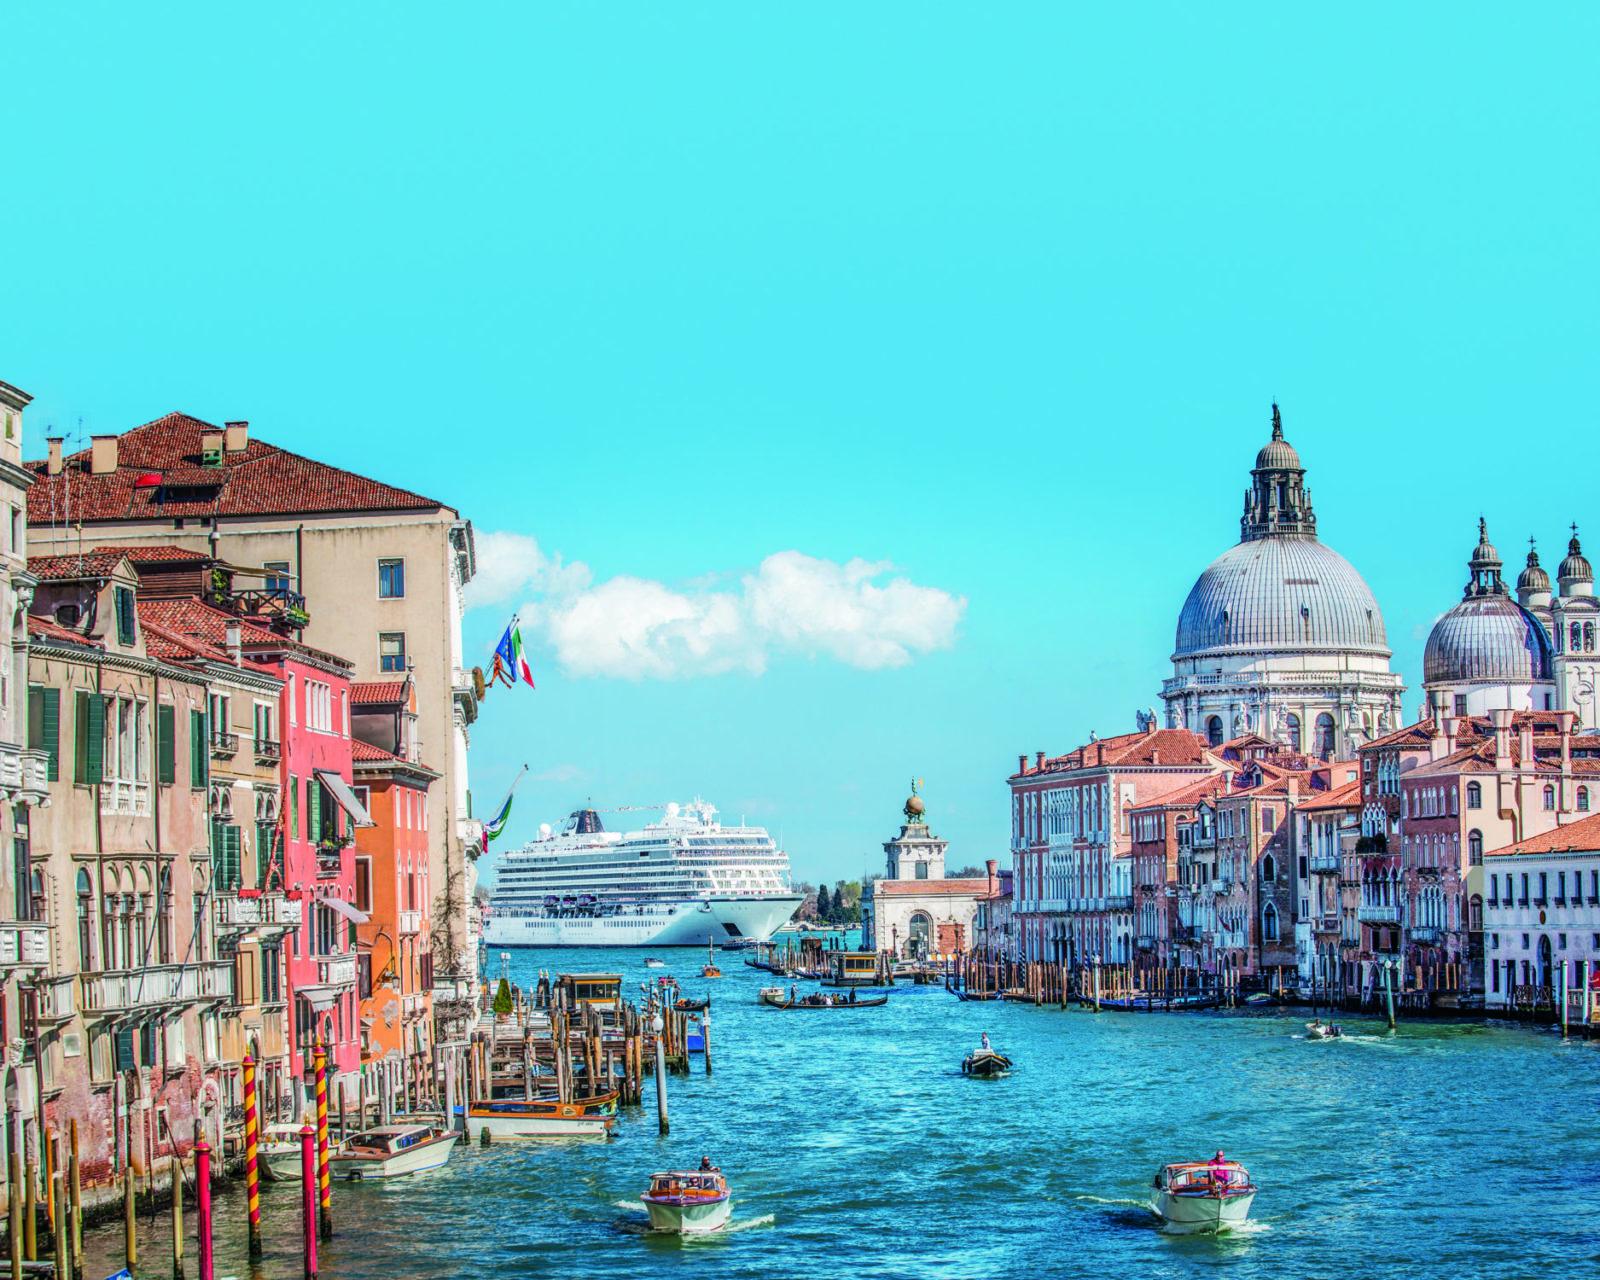 Viking Venice Canal